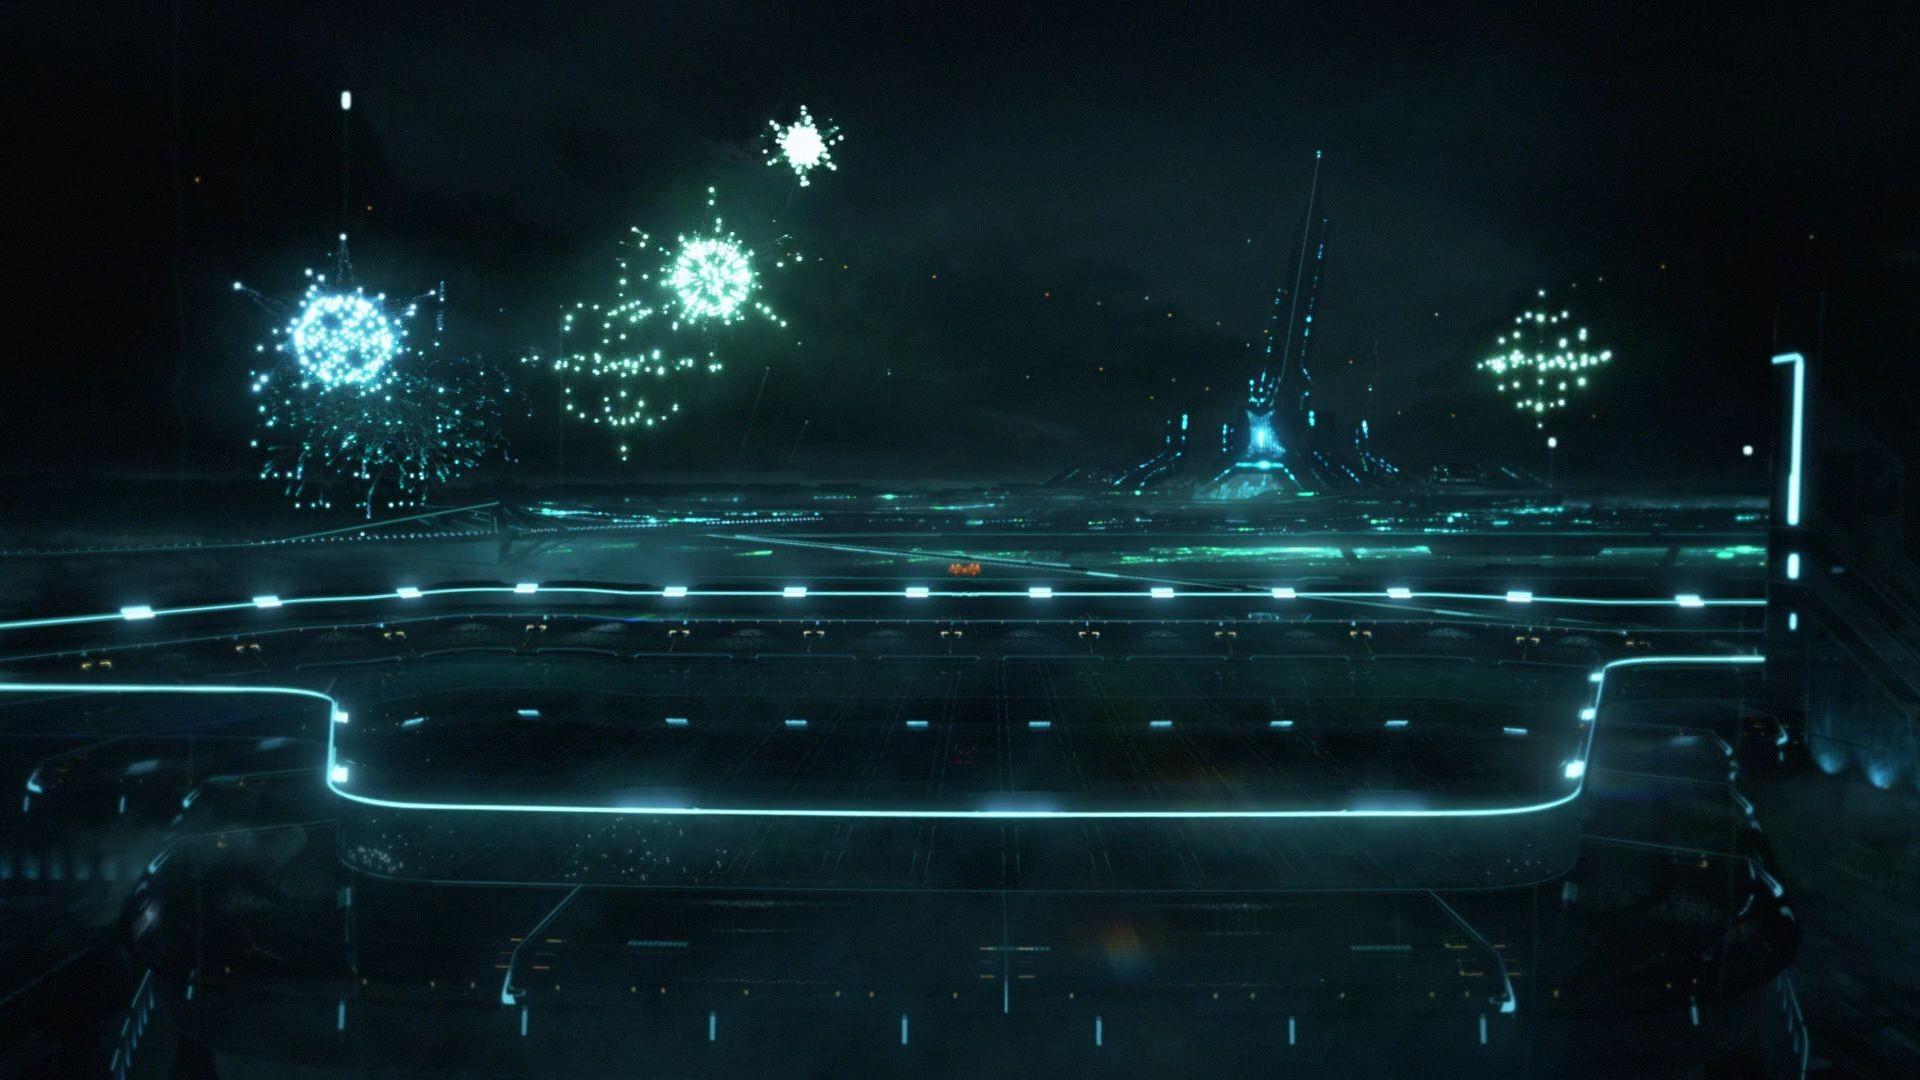 Wallpaper Night Reflection Movies Midnight Tron Legacy